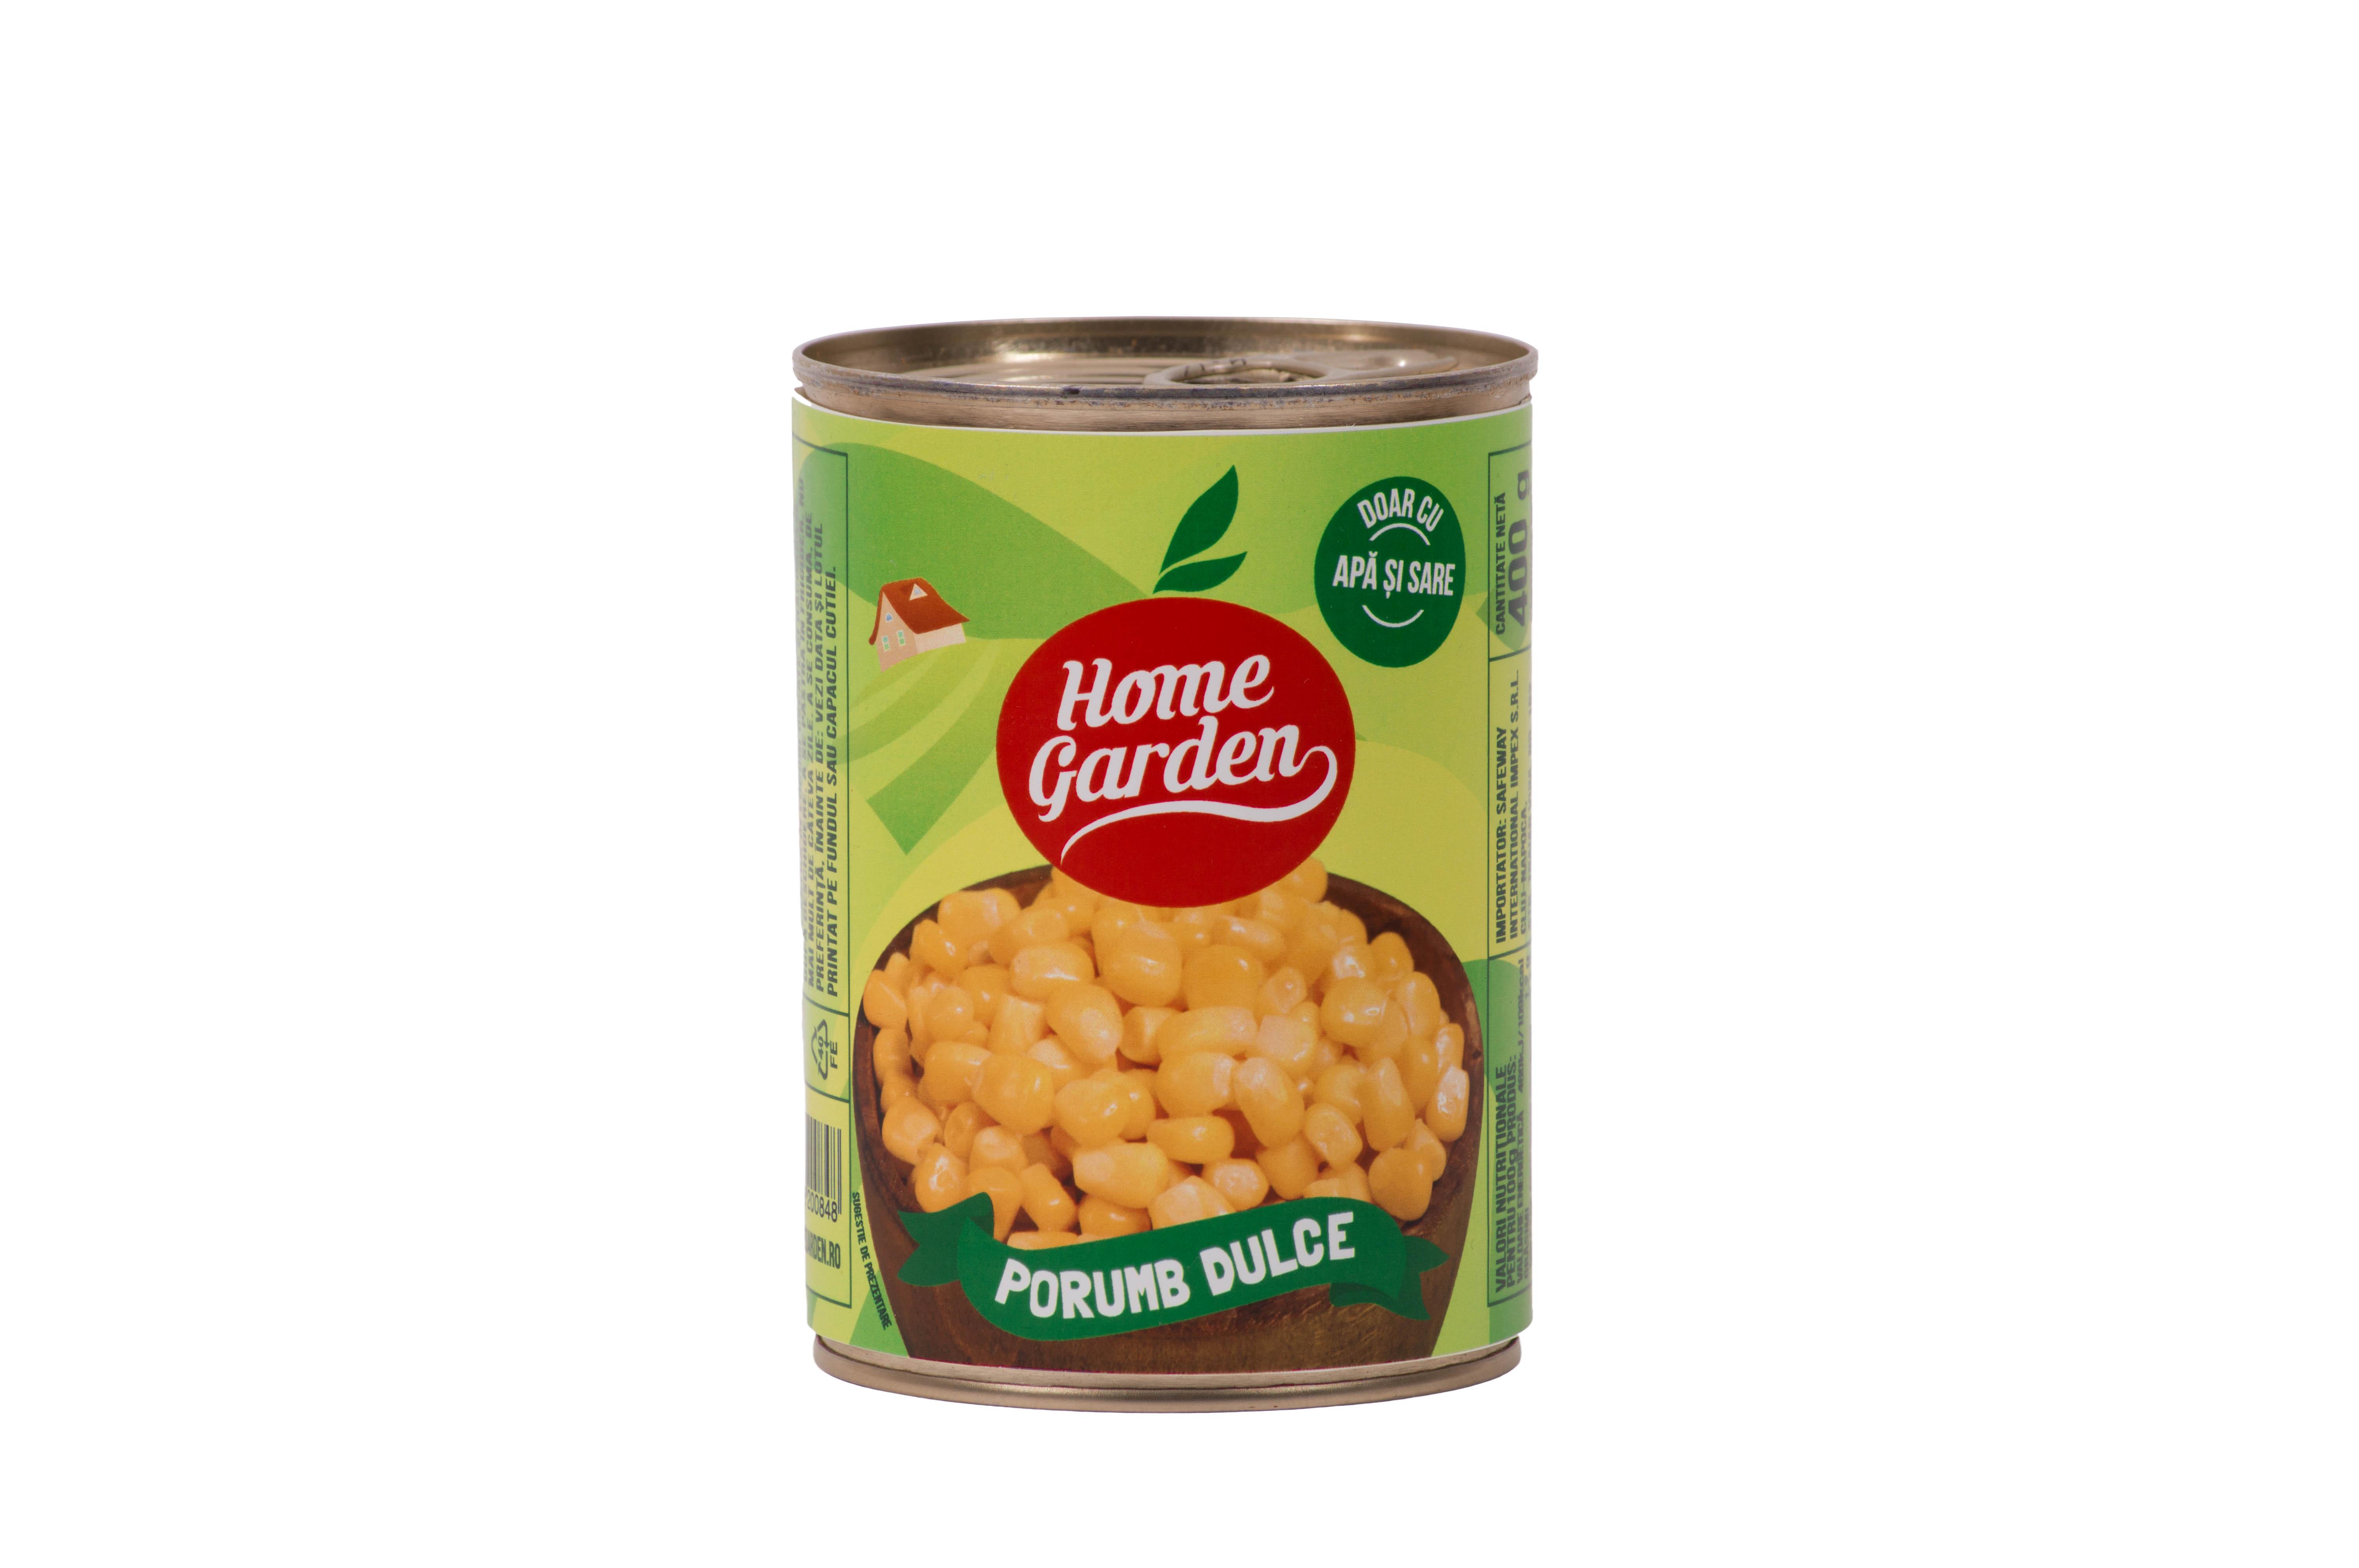 HOME GARDEN Porumb dulce 400g 20